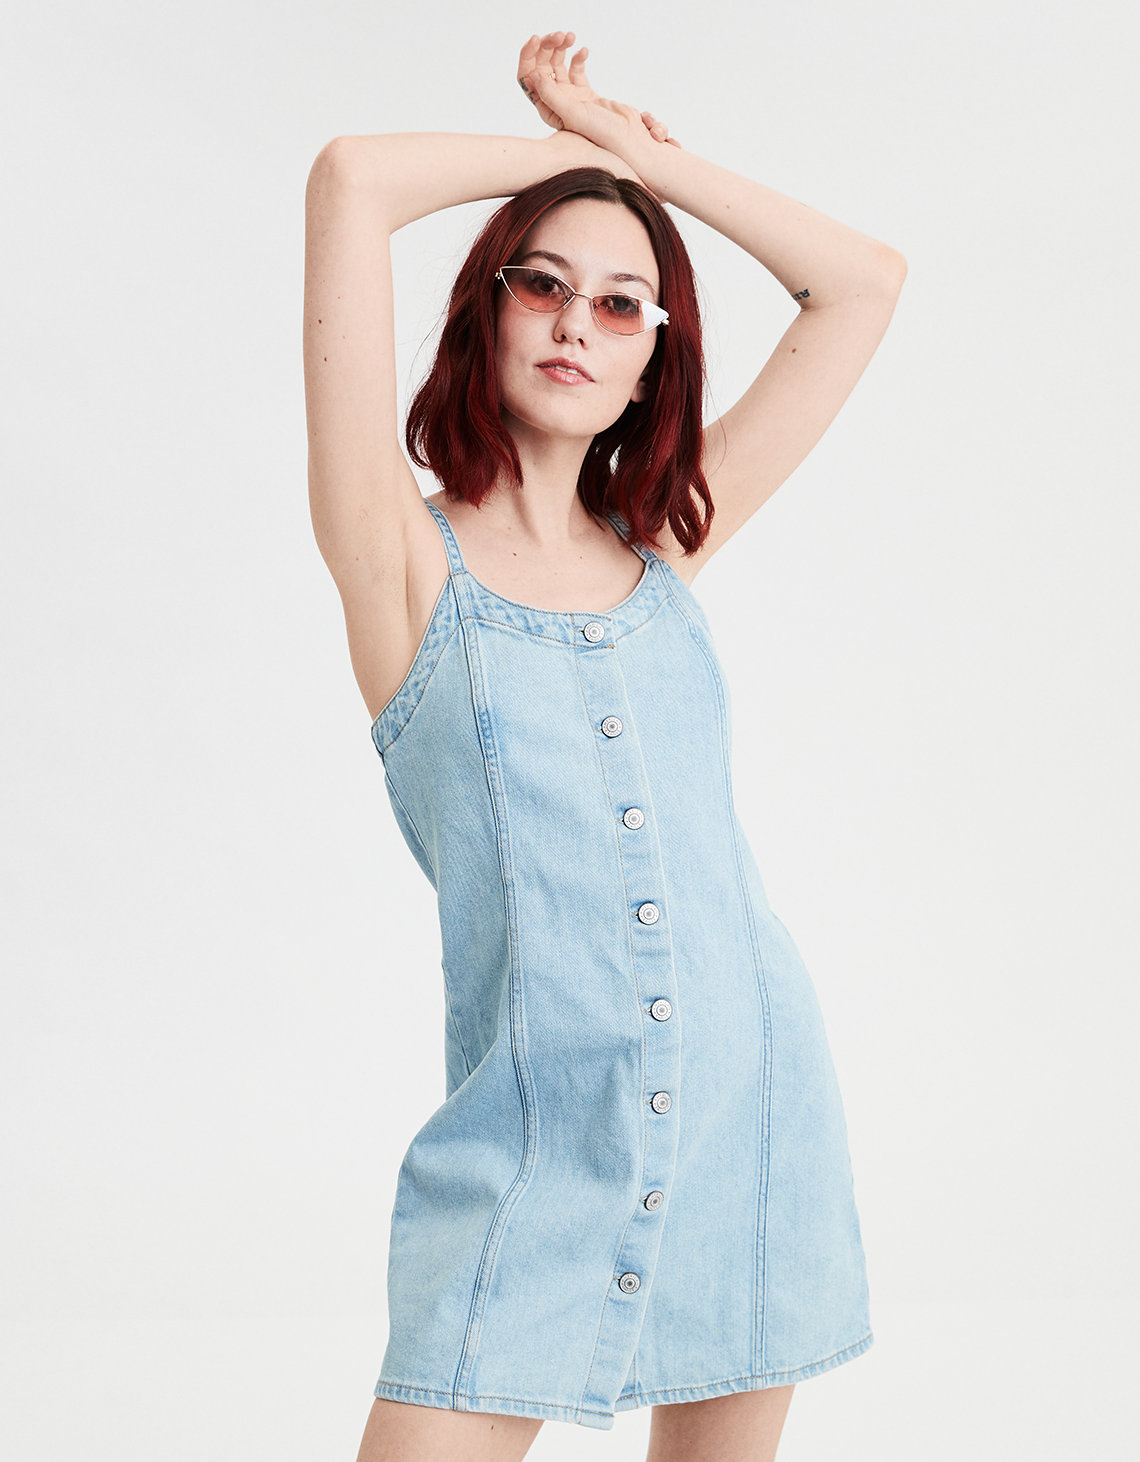 7eaccfd551 AE Denim Slip Dress. Placeholder image. Product Image